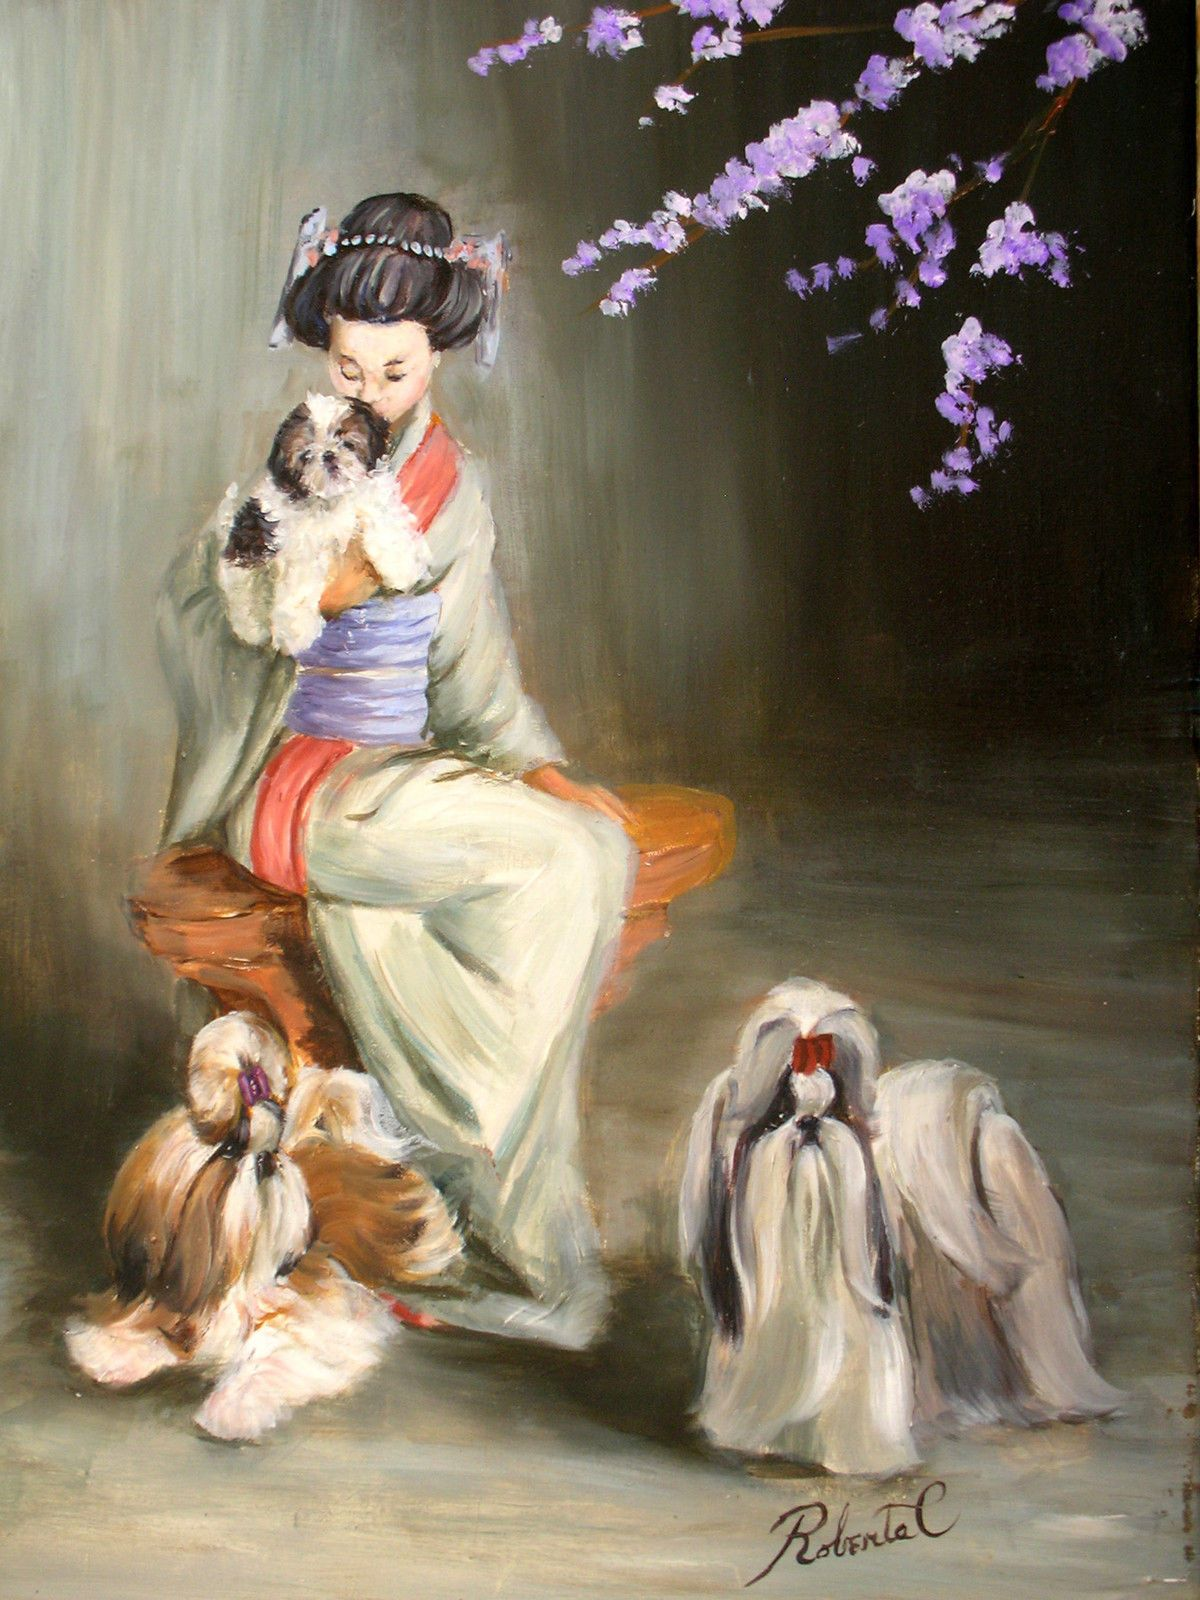 Pin By Sonnie B Mosley On Shih Tzu Shih Tzu Dog Art Shih Tzu Humor